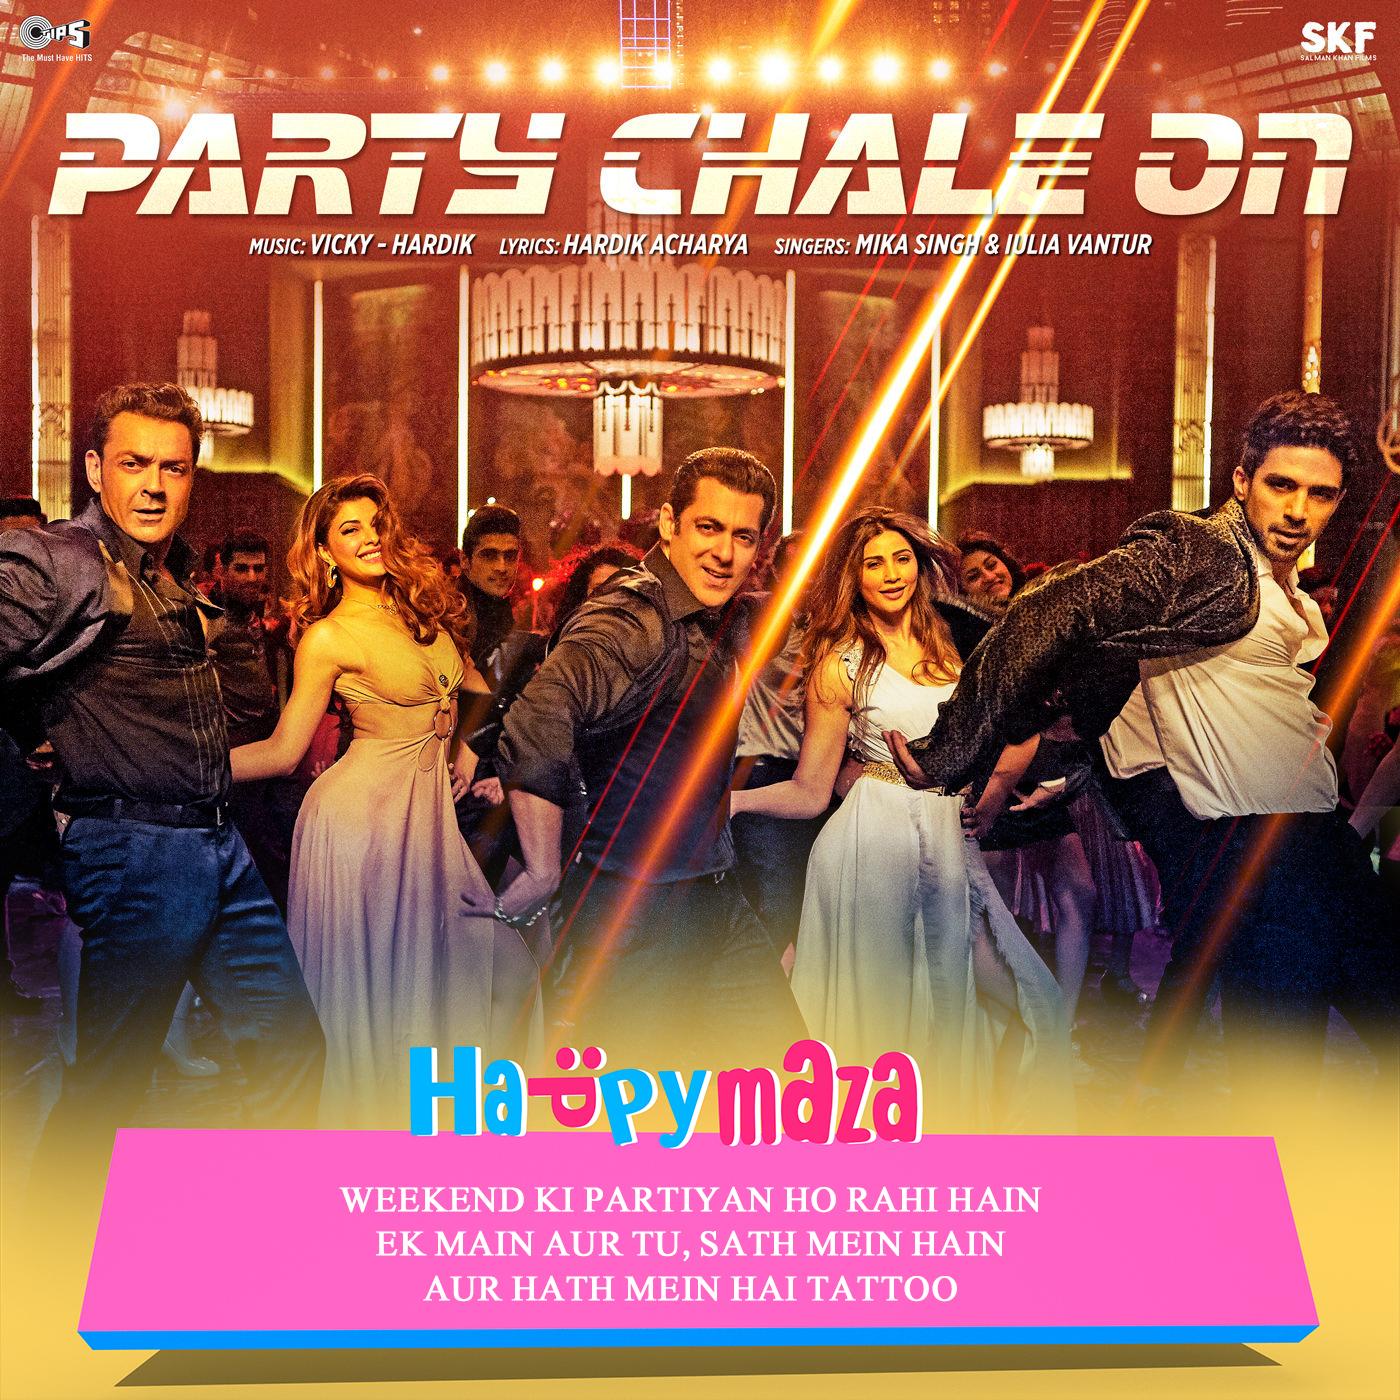 Party Chale On Lyrics - Race 3 - Mika Singh Iulia Vantur - 2018